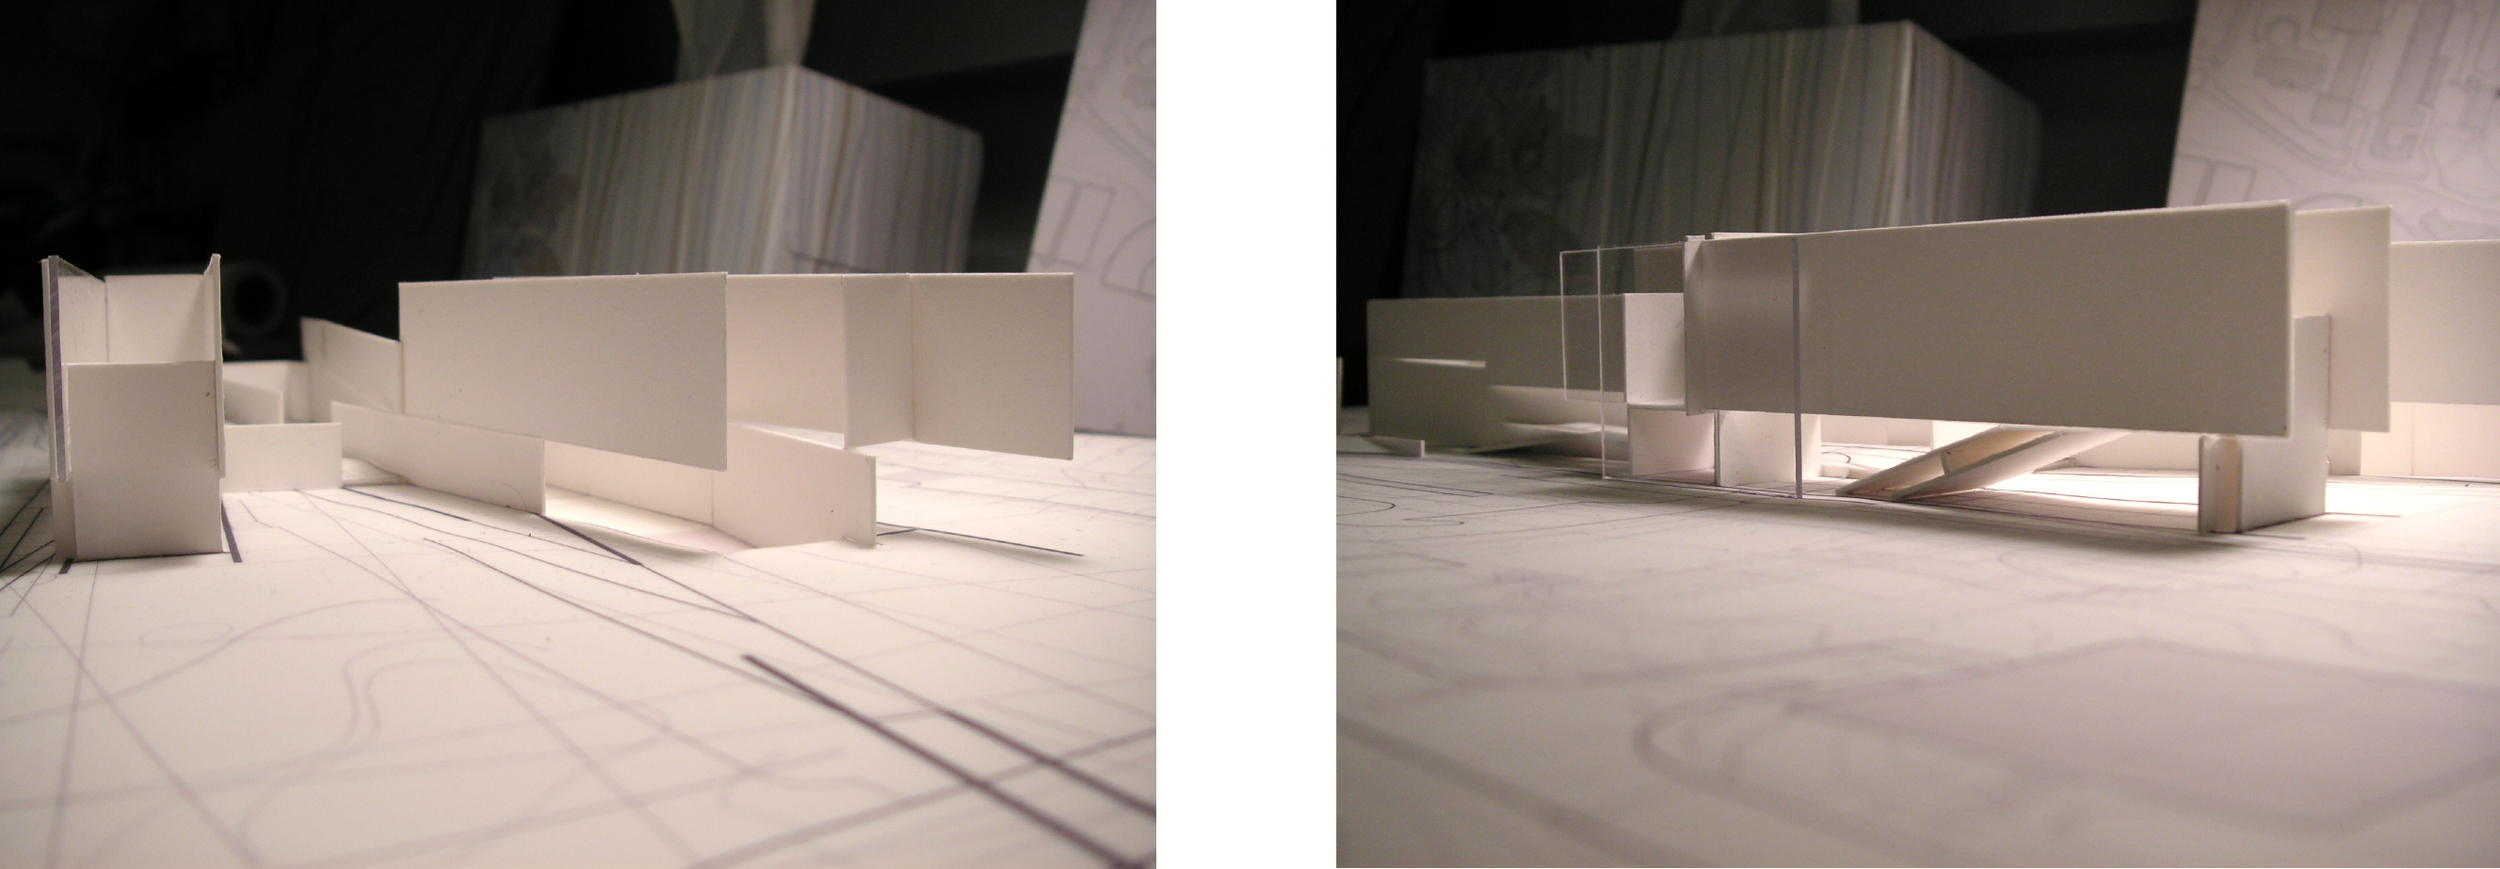 princeton-performing-arts_model.jpg